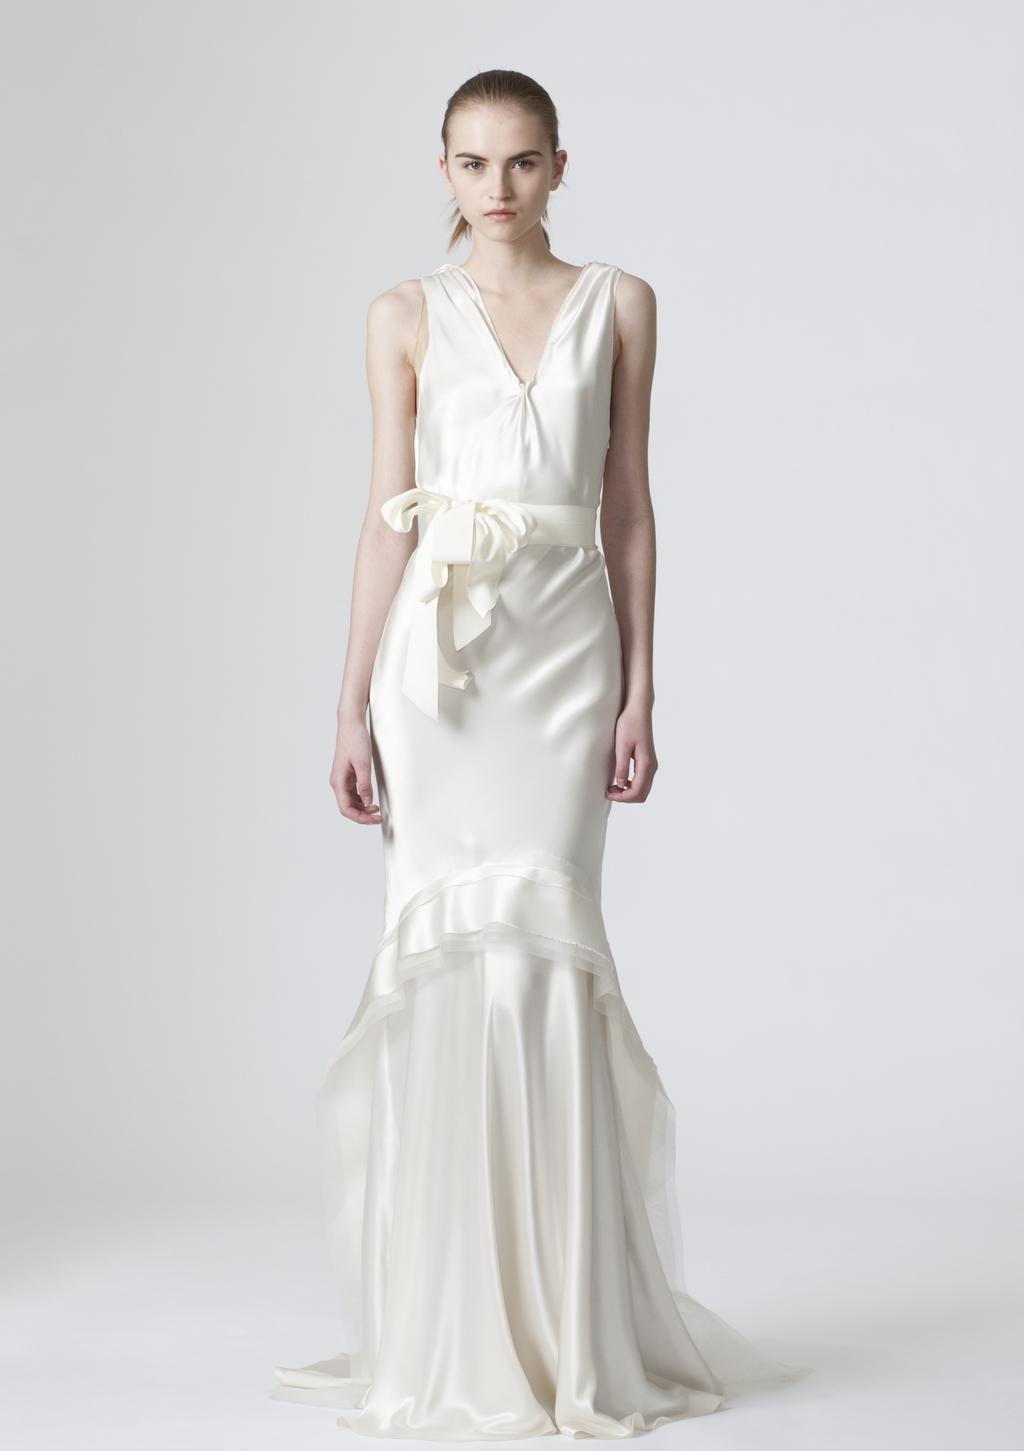 Vera-wang-wedding-dresses-spring-2010-3.full